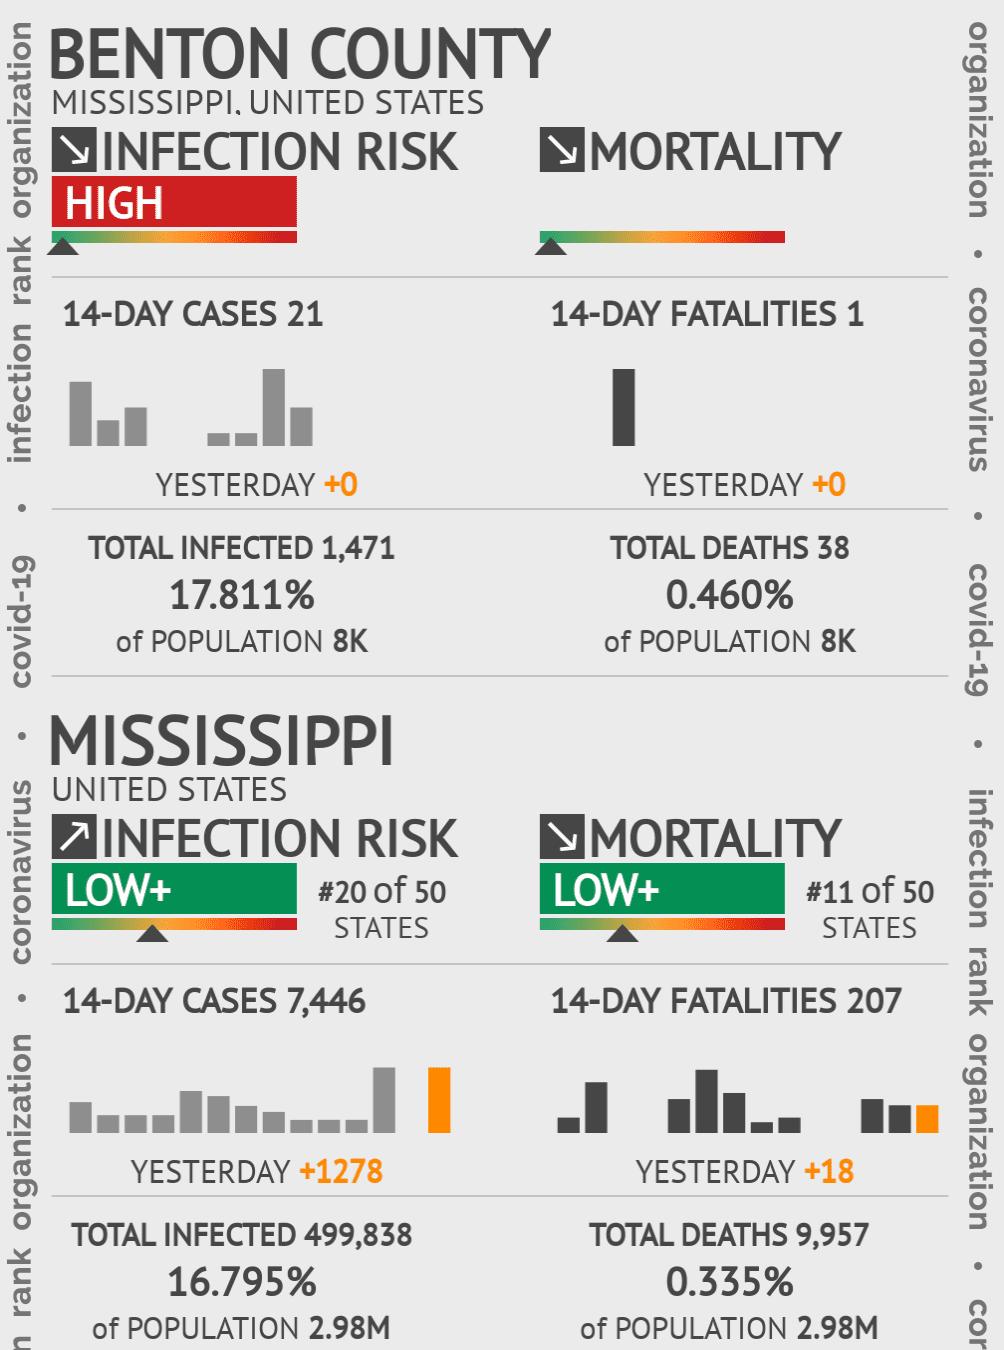 Benton County Coronavirus Covid-19 Risk of Infection on March 23, 2021